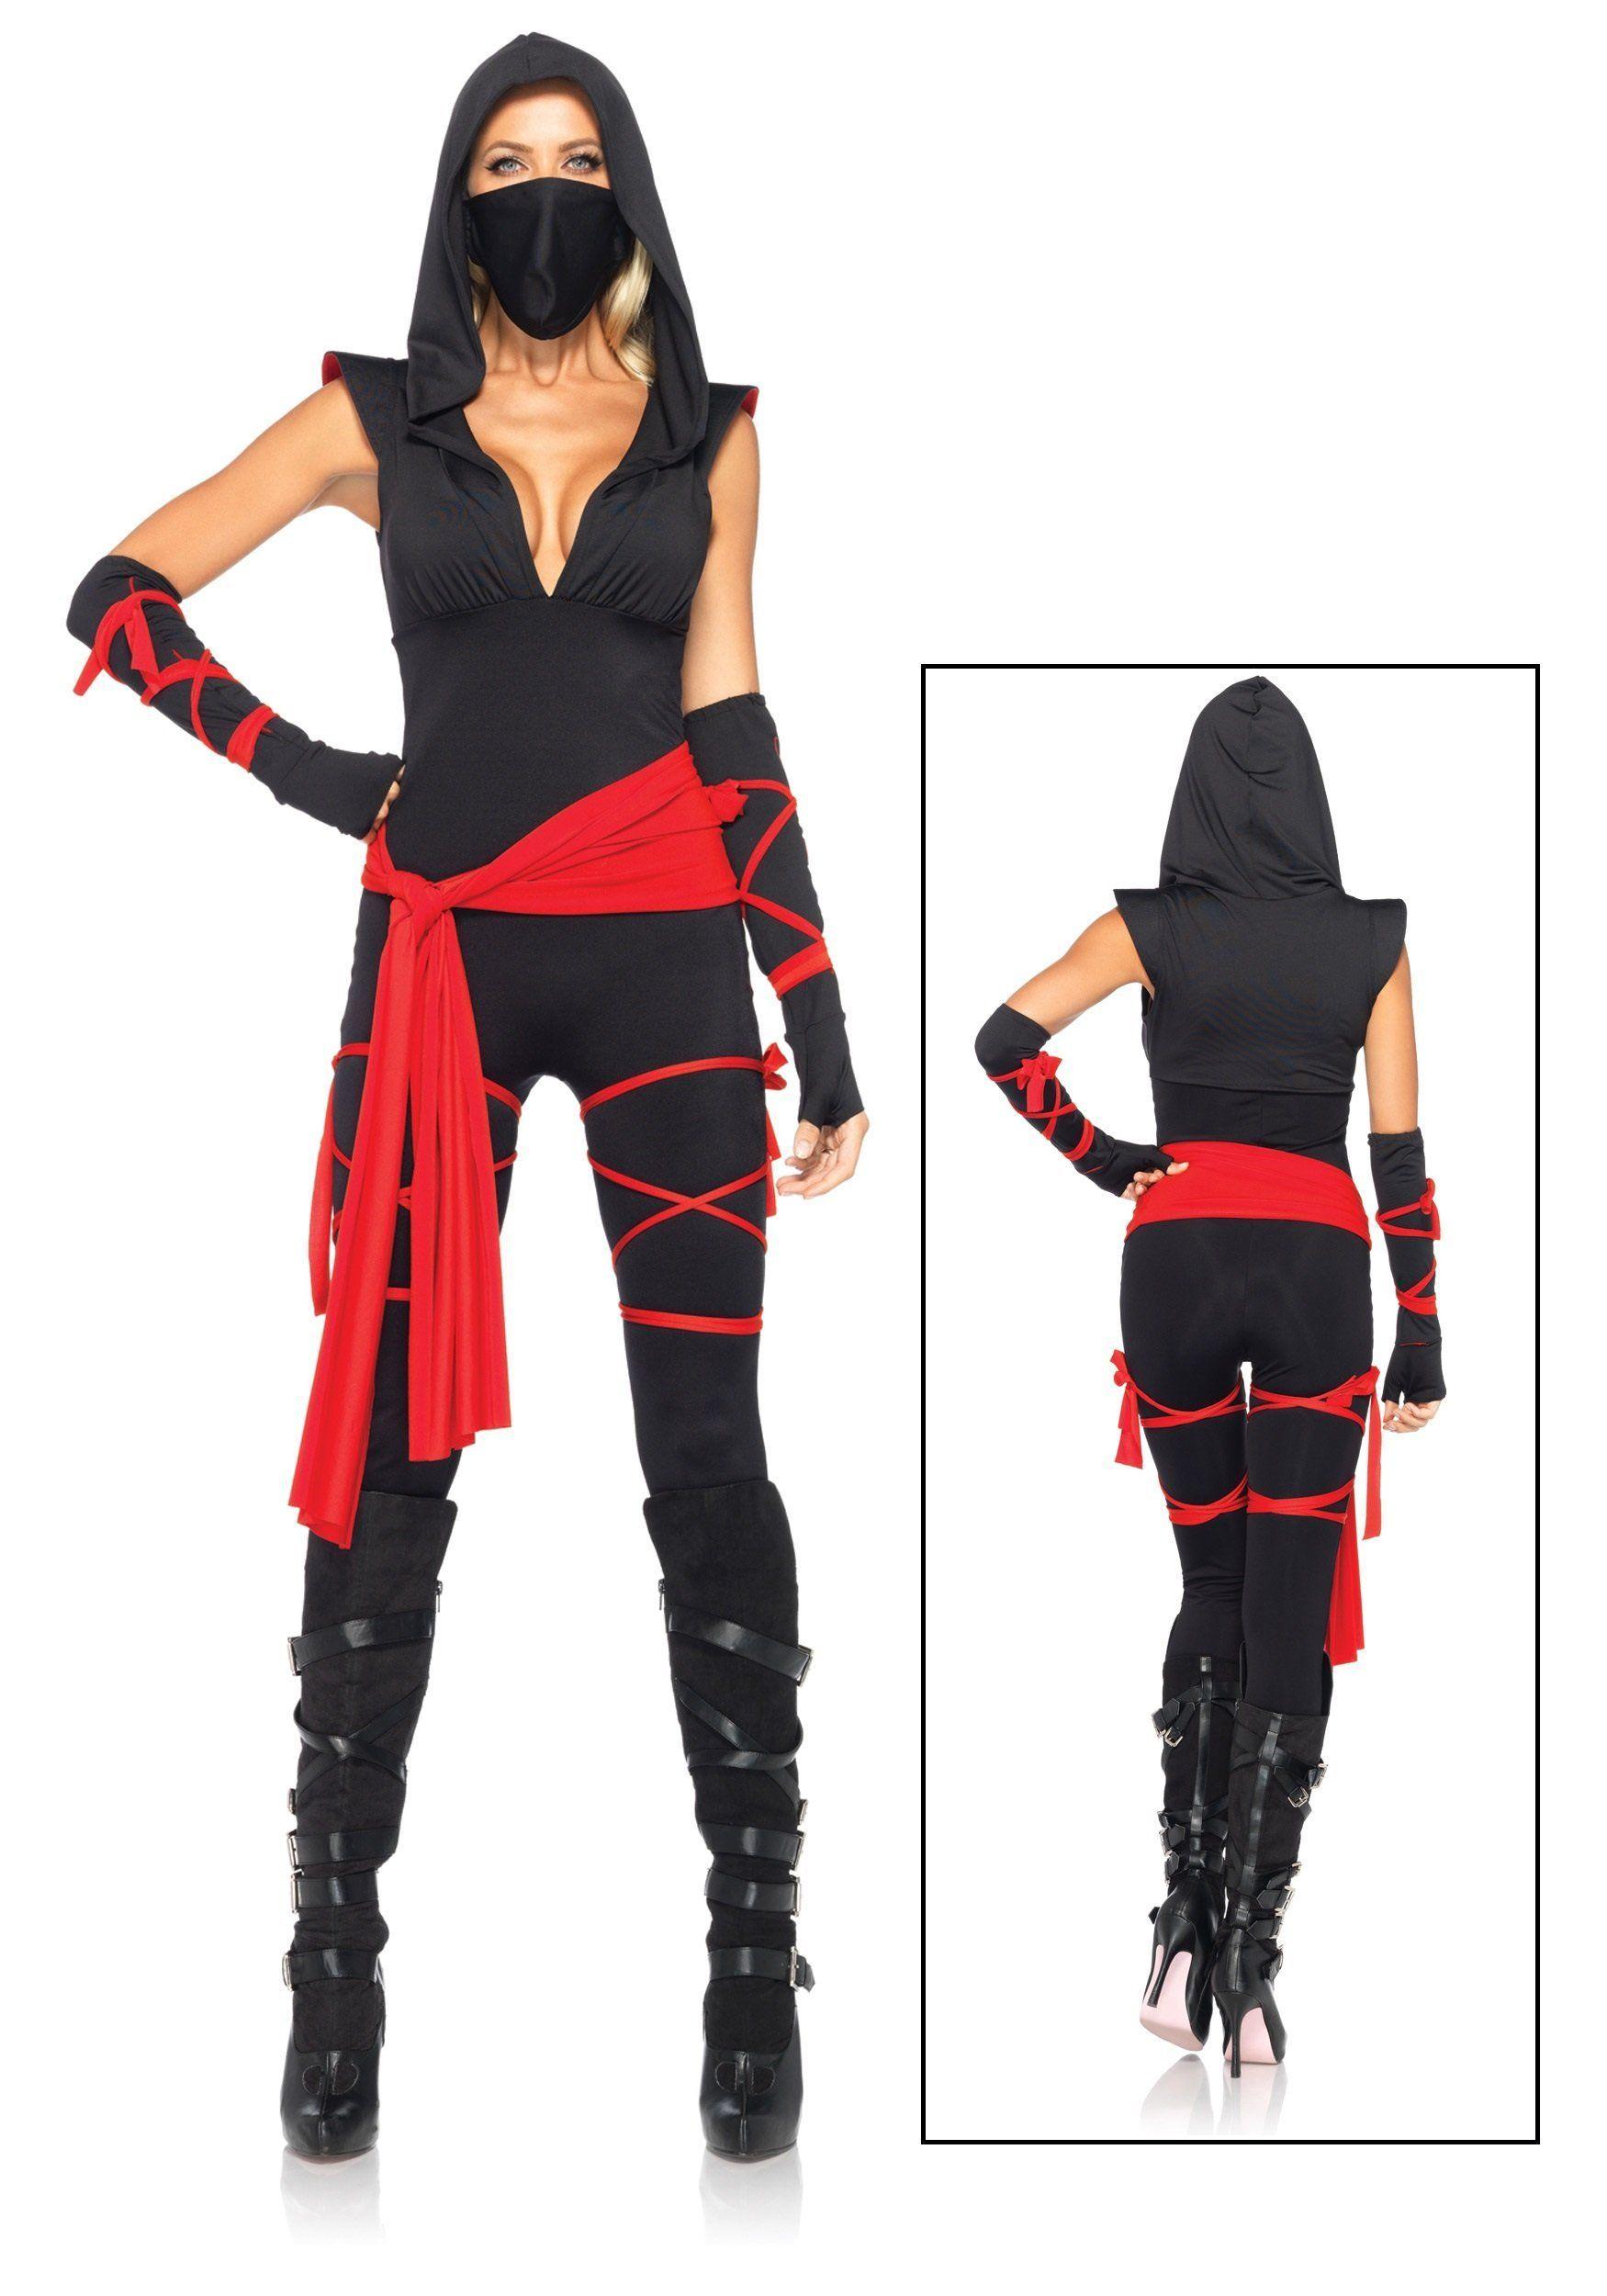 Black Sexy Deadly Ninja Halloween Costume